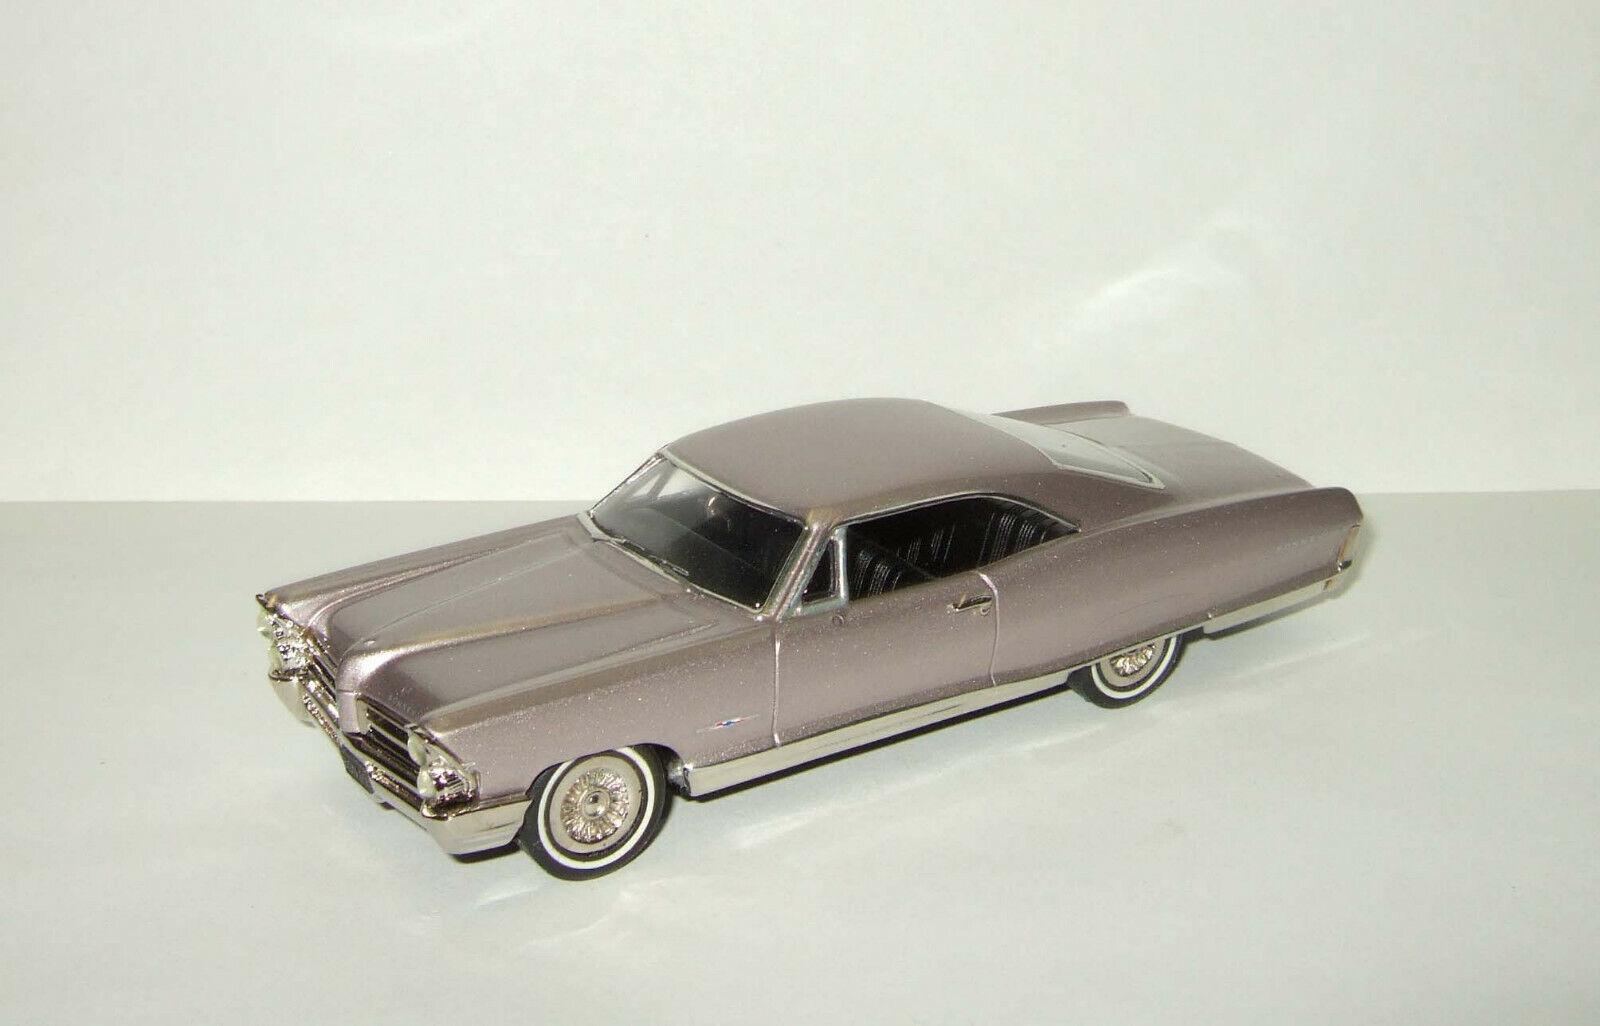 1 43 Madison Models Pontiac Bonneville Hardtop 1965 Limit MAD 4